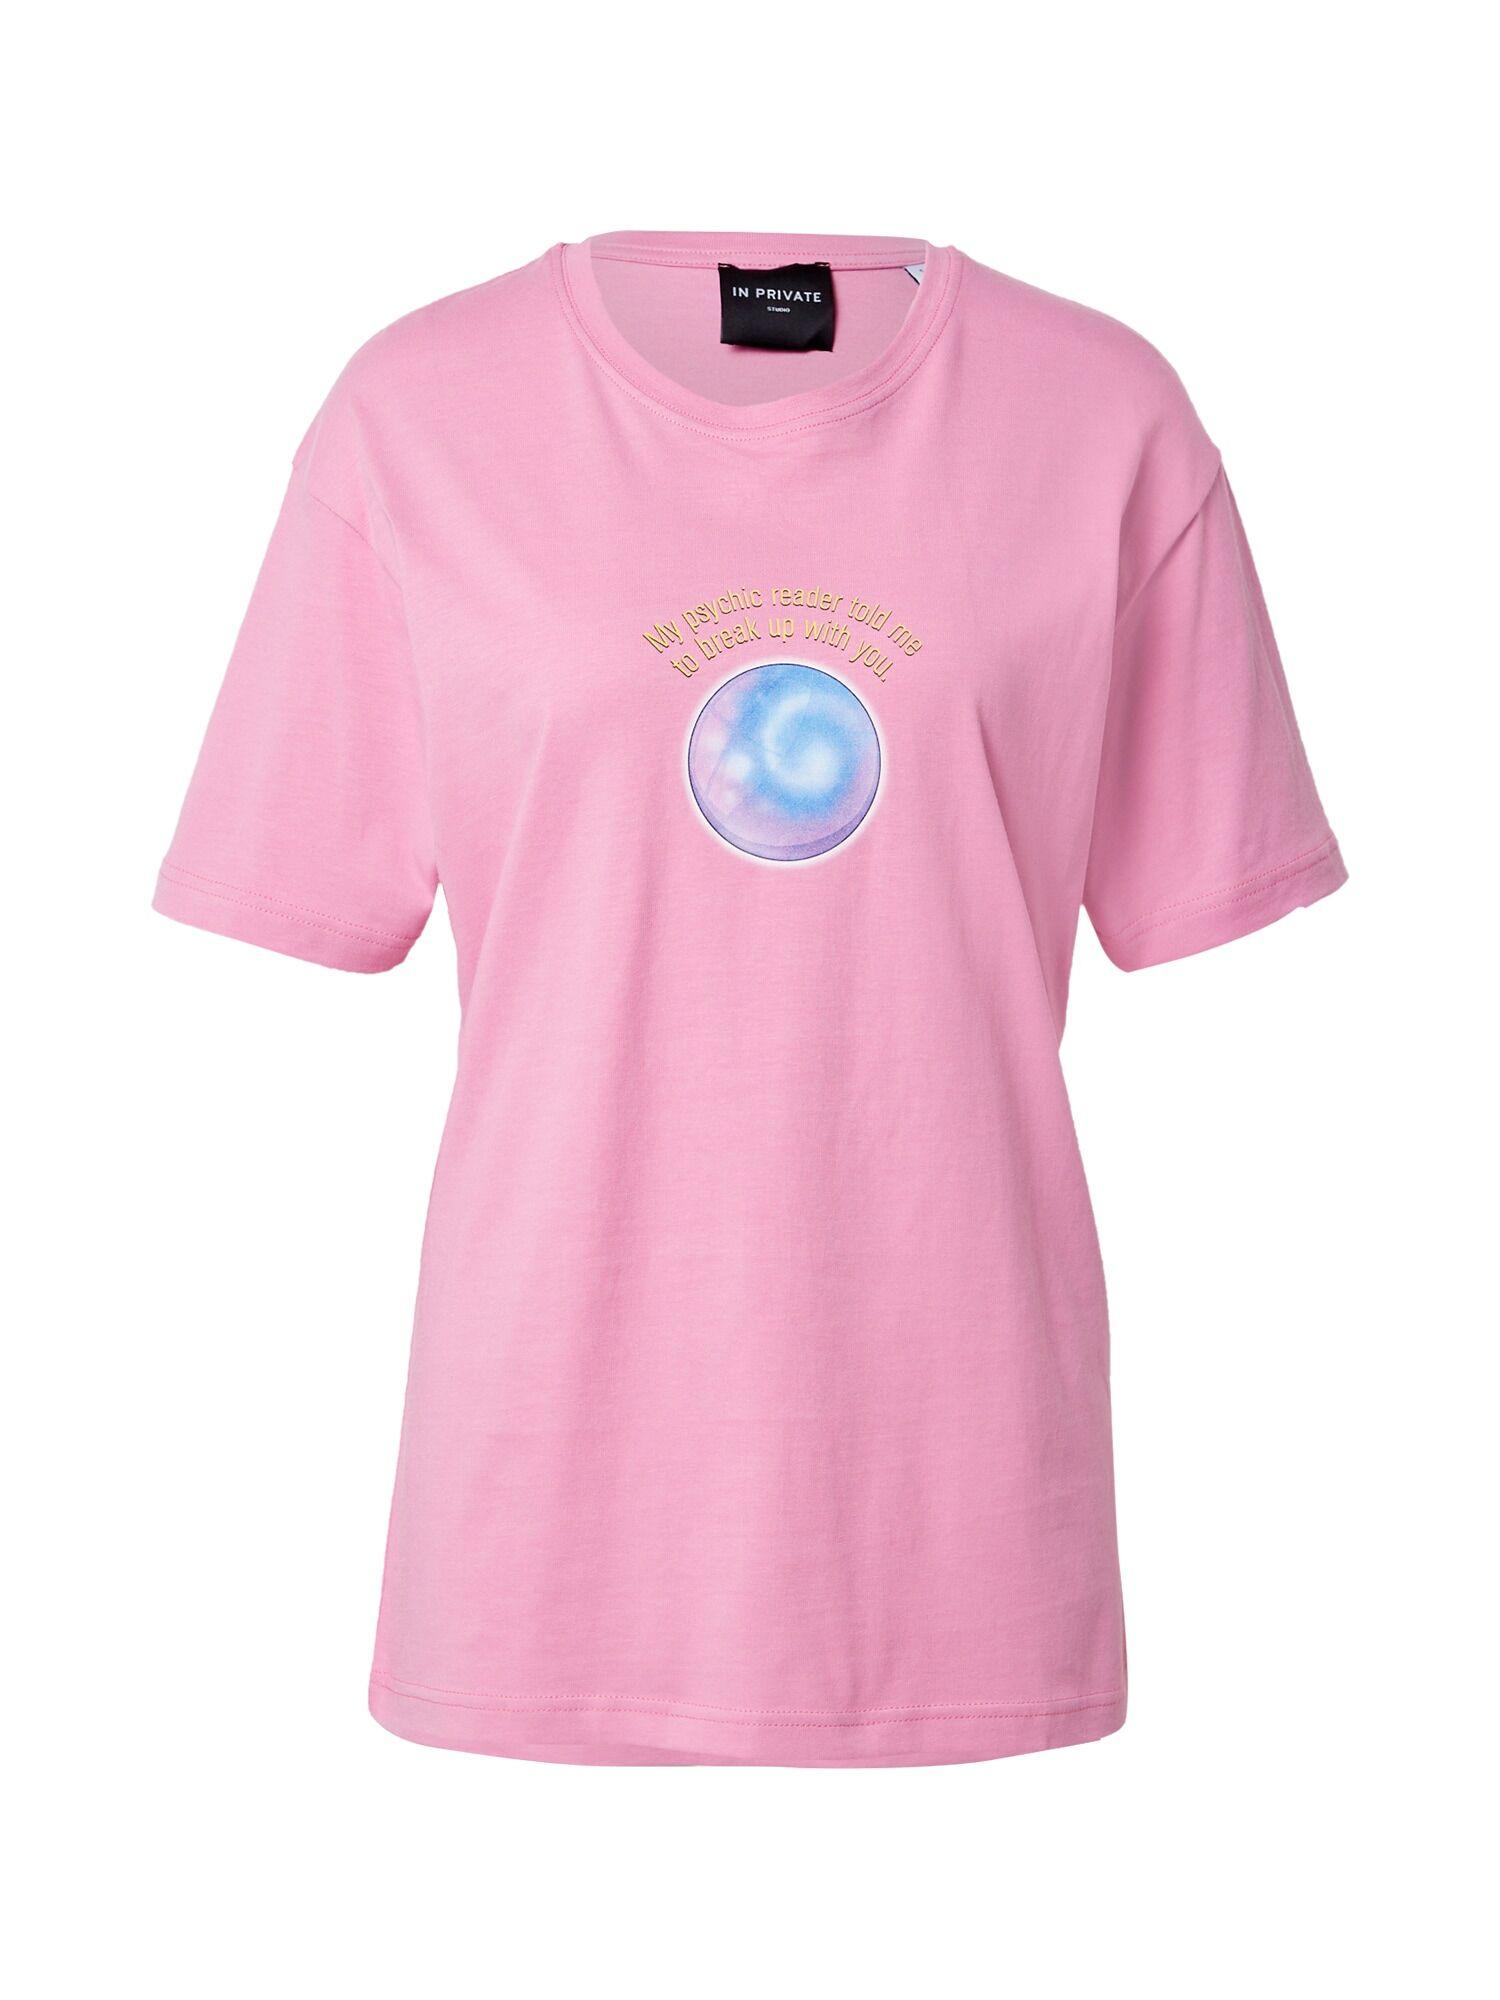 IN PRIVATE Studio T-shirt 'BIANCA'S'  - Rose - Taille: L - female